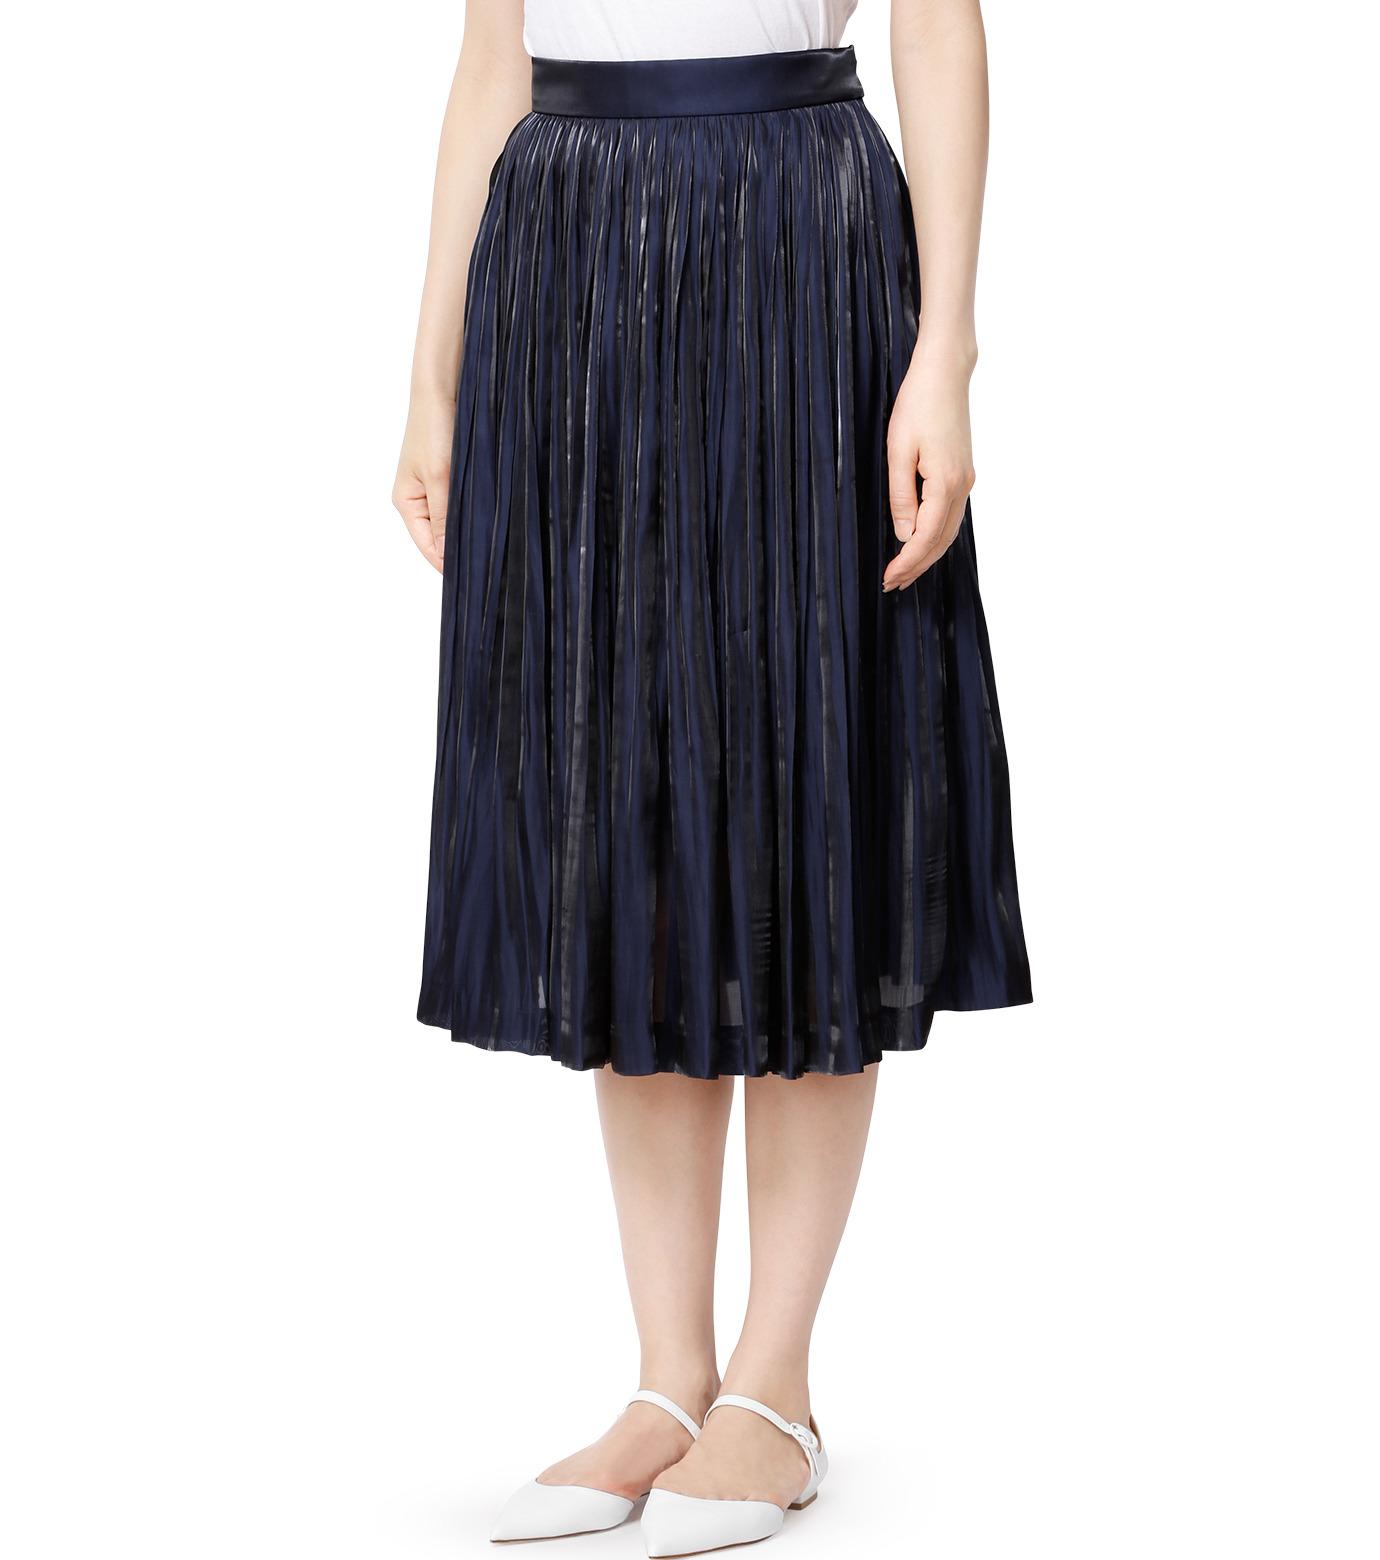 LE CIEL BLEU(ルシェルブルー)のプリーツスカート-NAVY(スカート/skirt)-18A67206 拡大詳細画像1